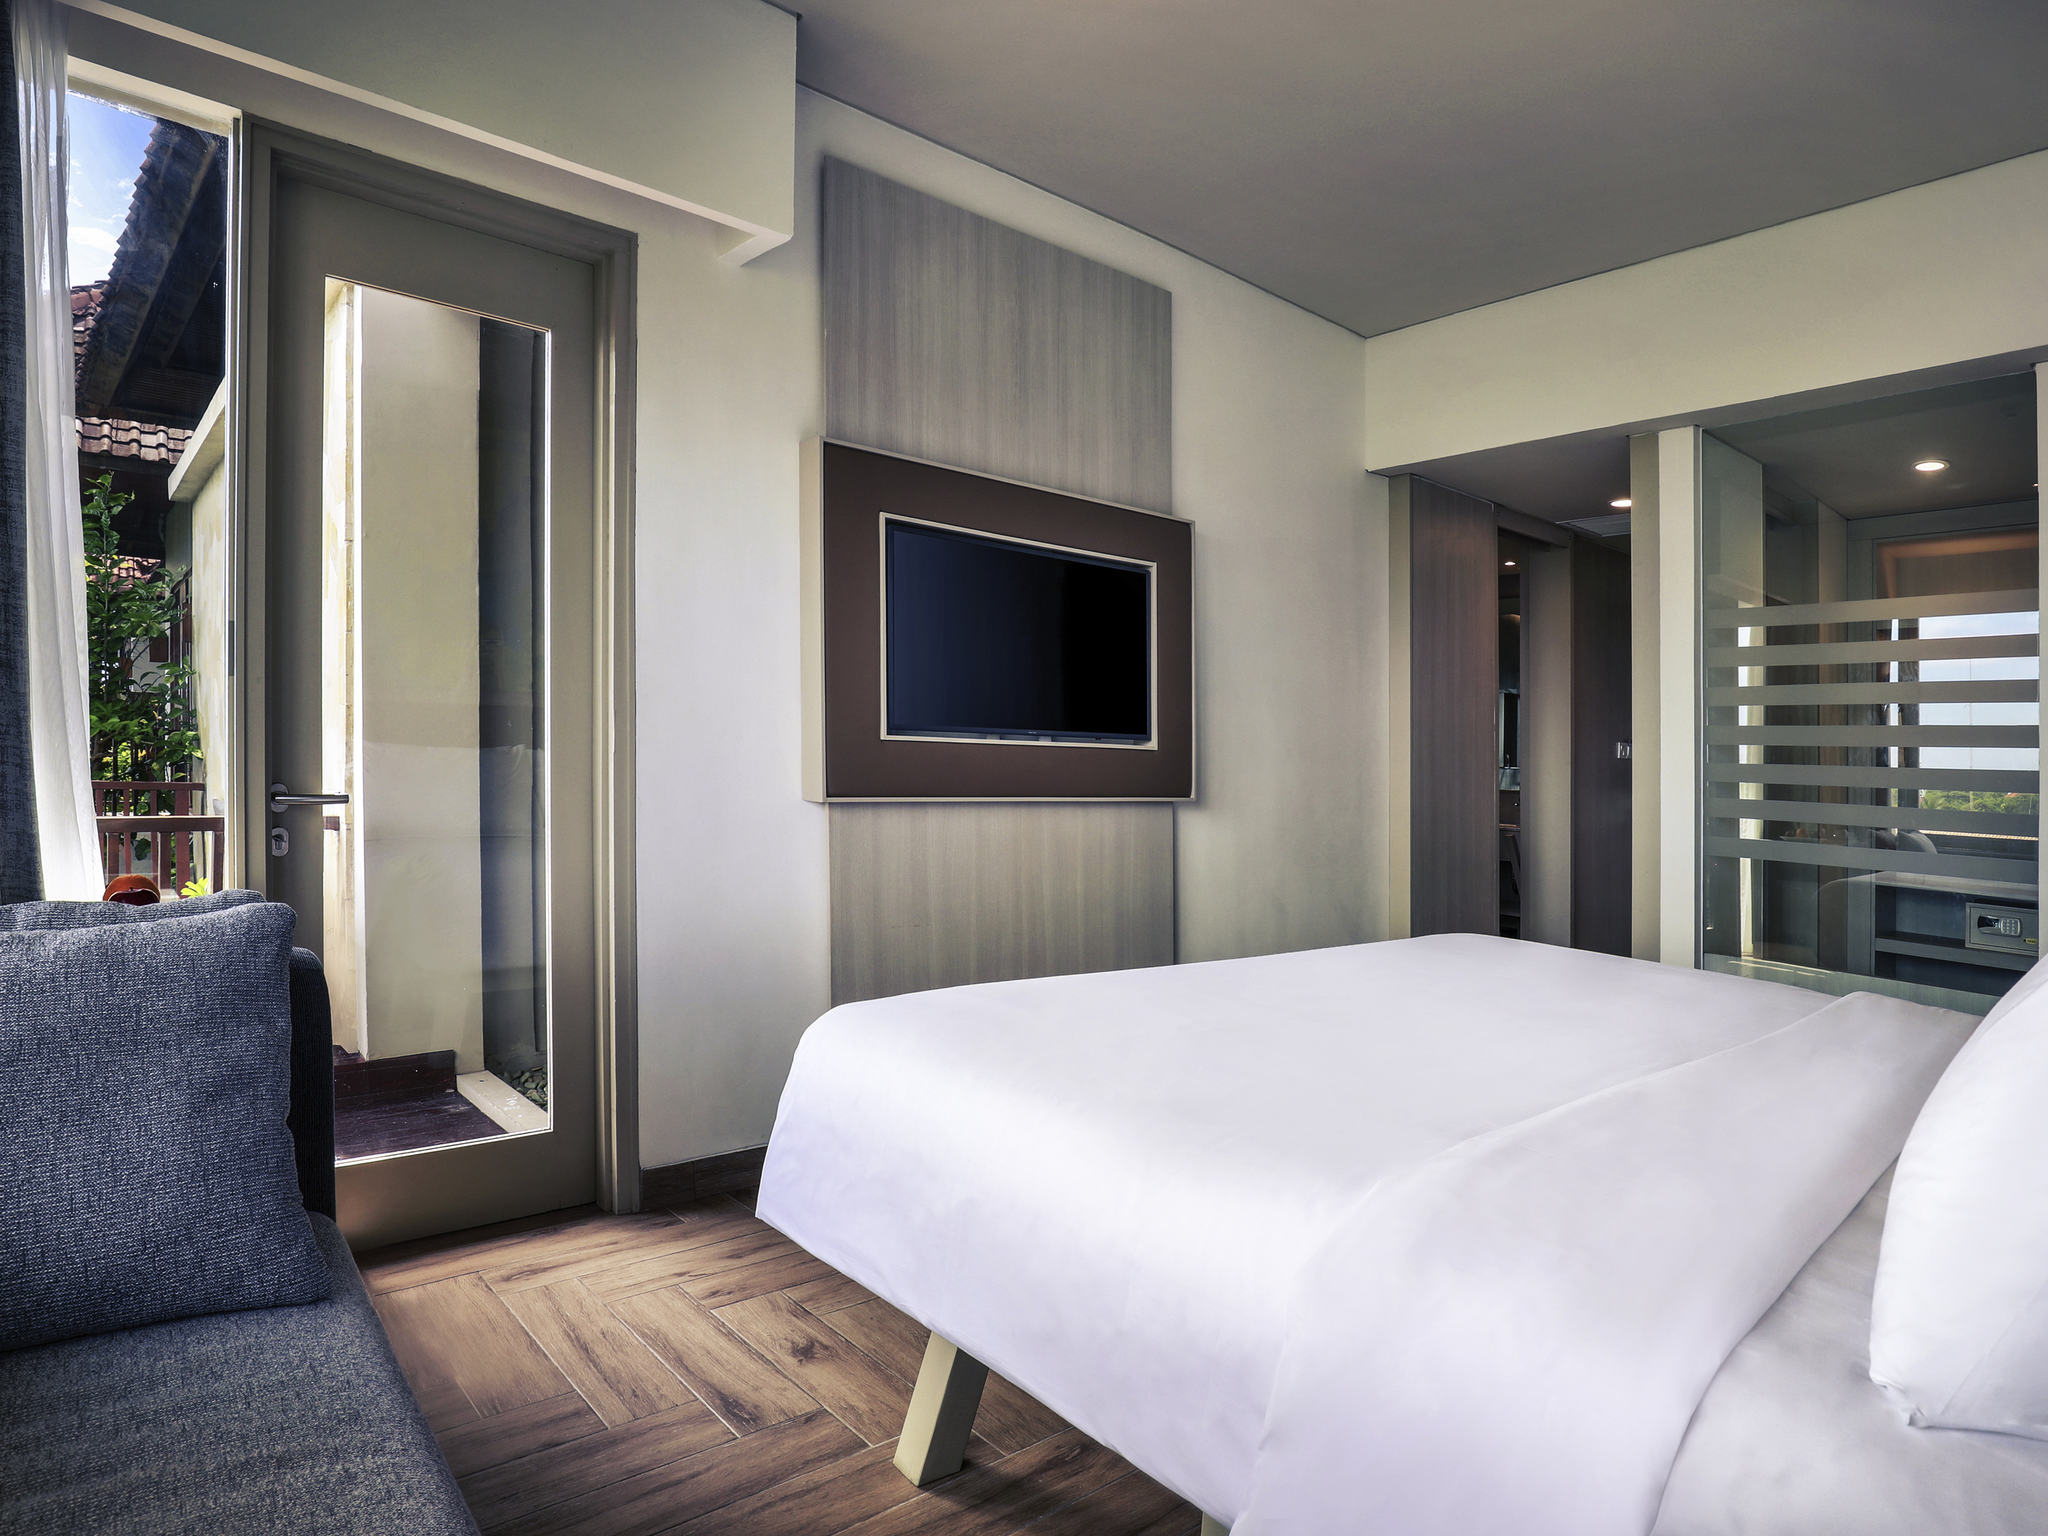 Mercure Kuta Bali Mid Scale Hotel Accorhotels Voucer Best Western Resort Rooms